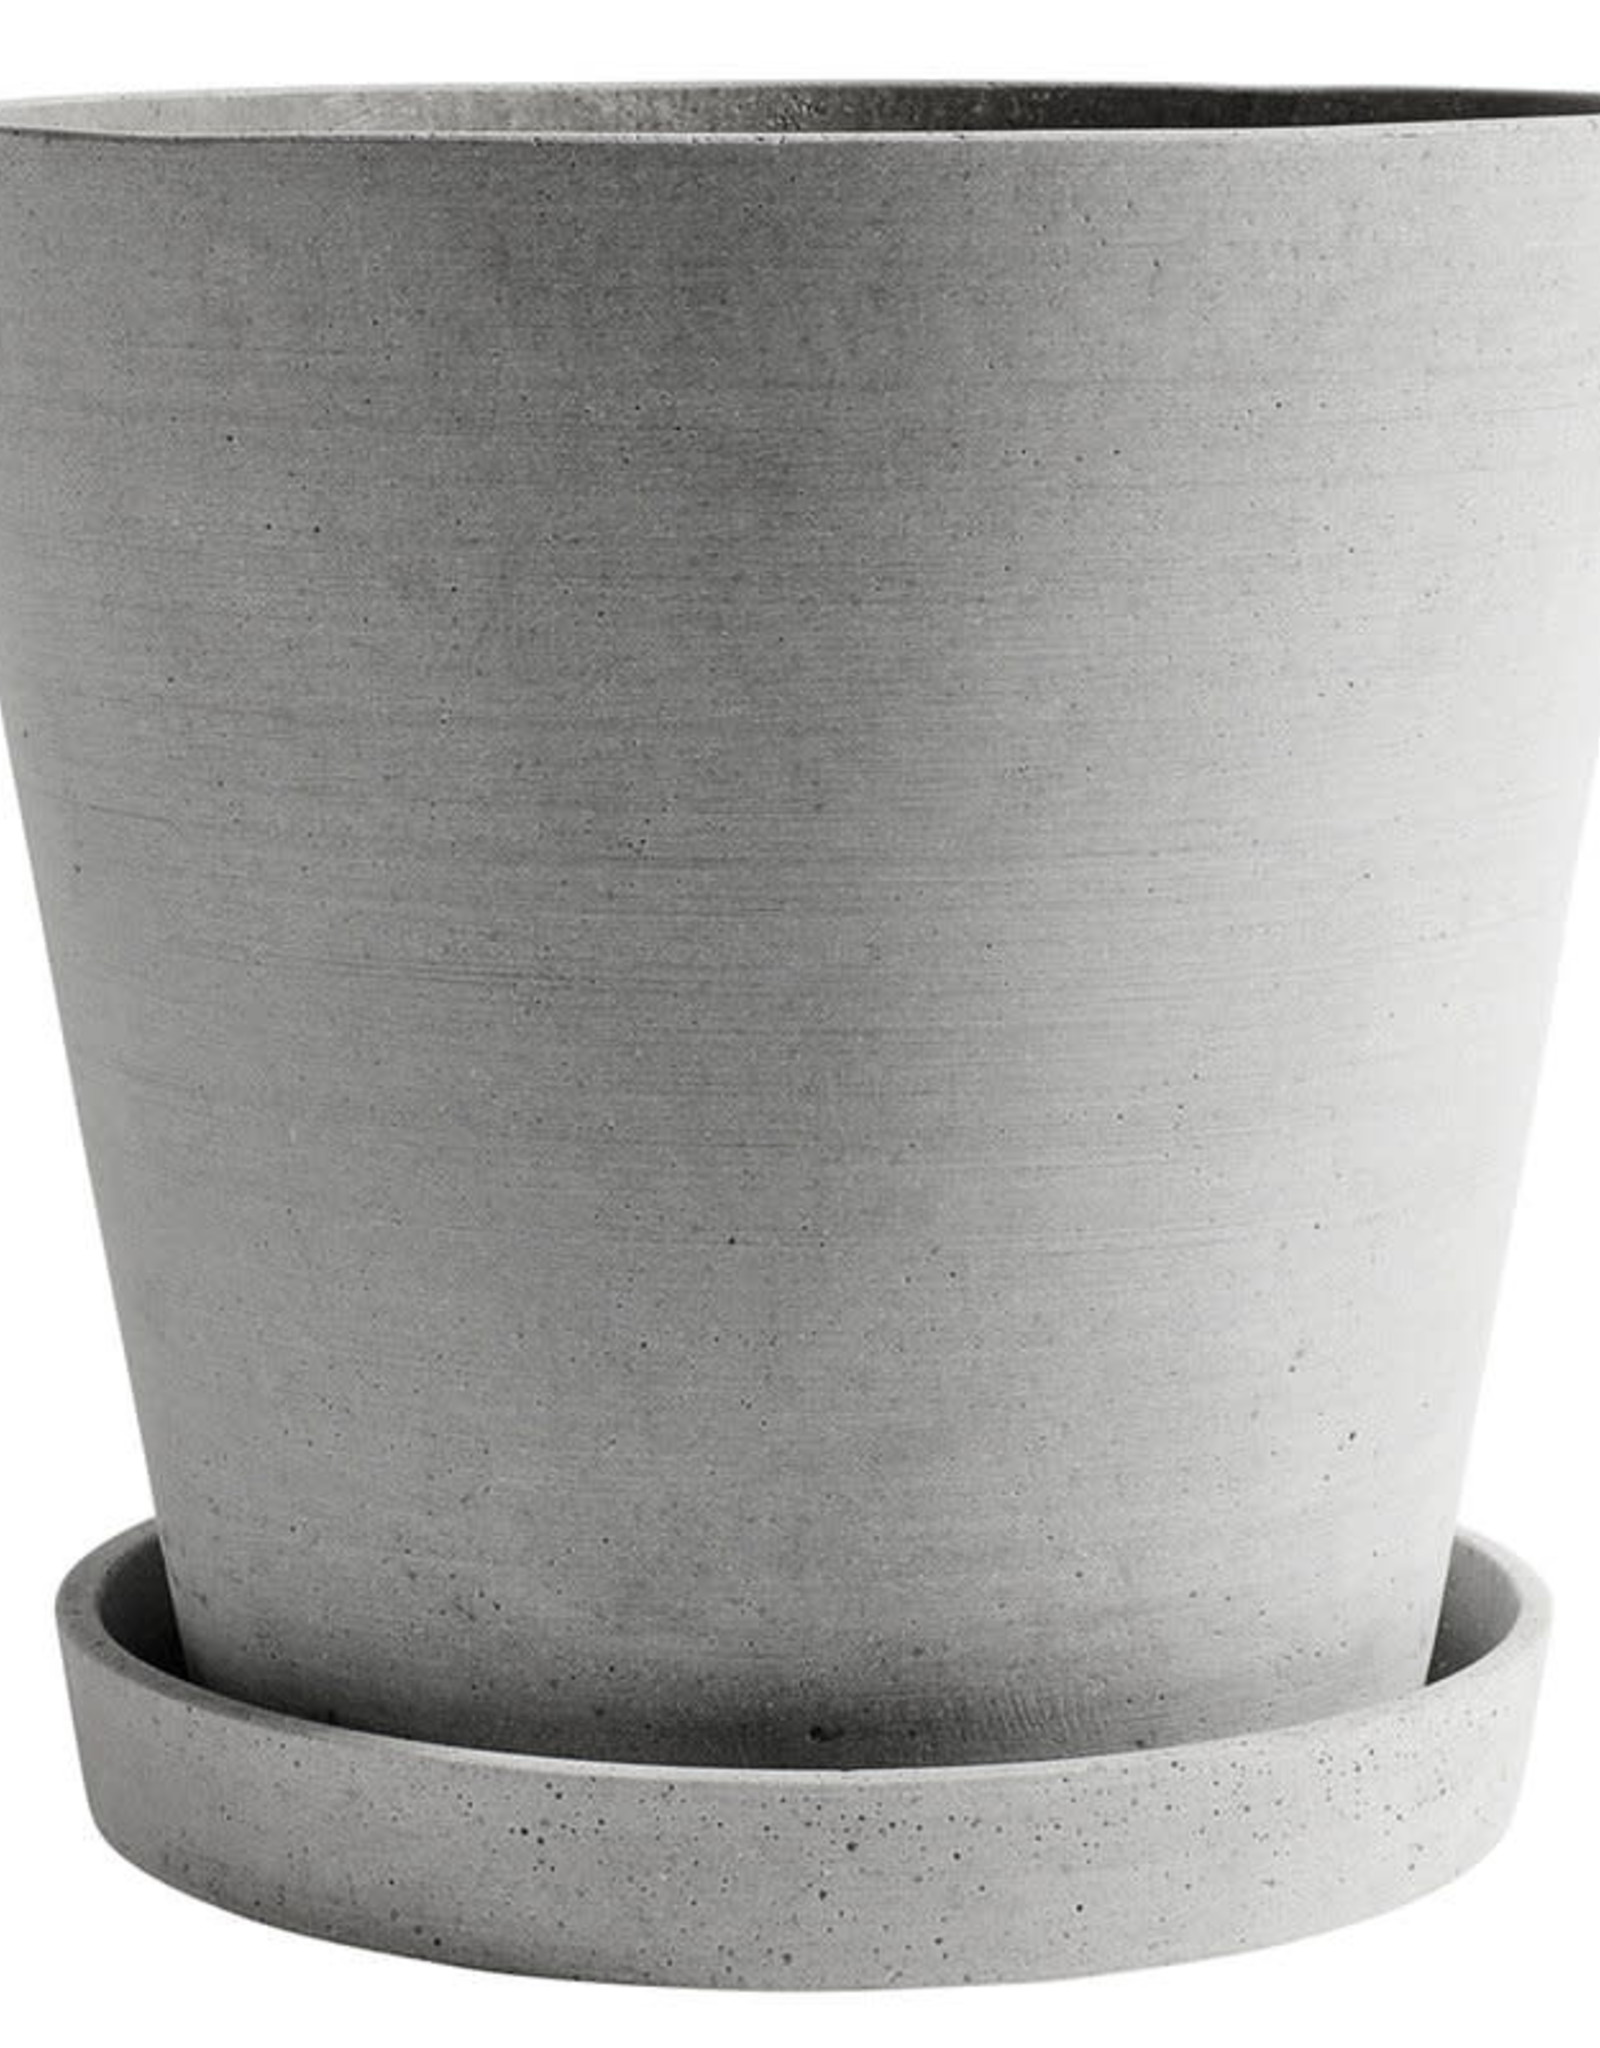 HAY HAY Flowerpot with Saucer XXXL grey